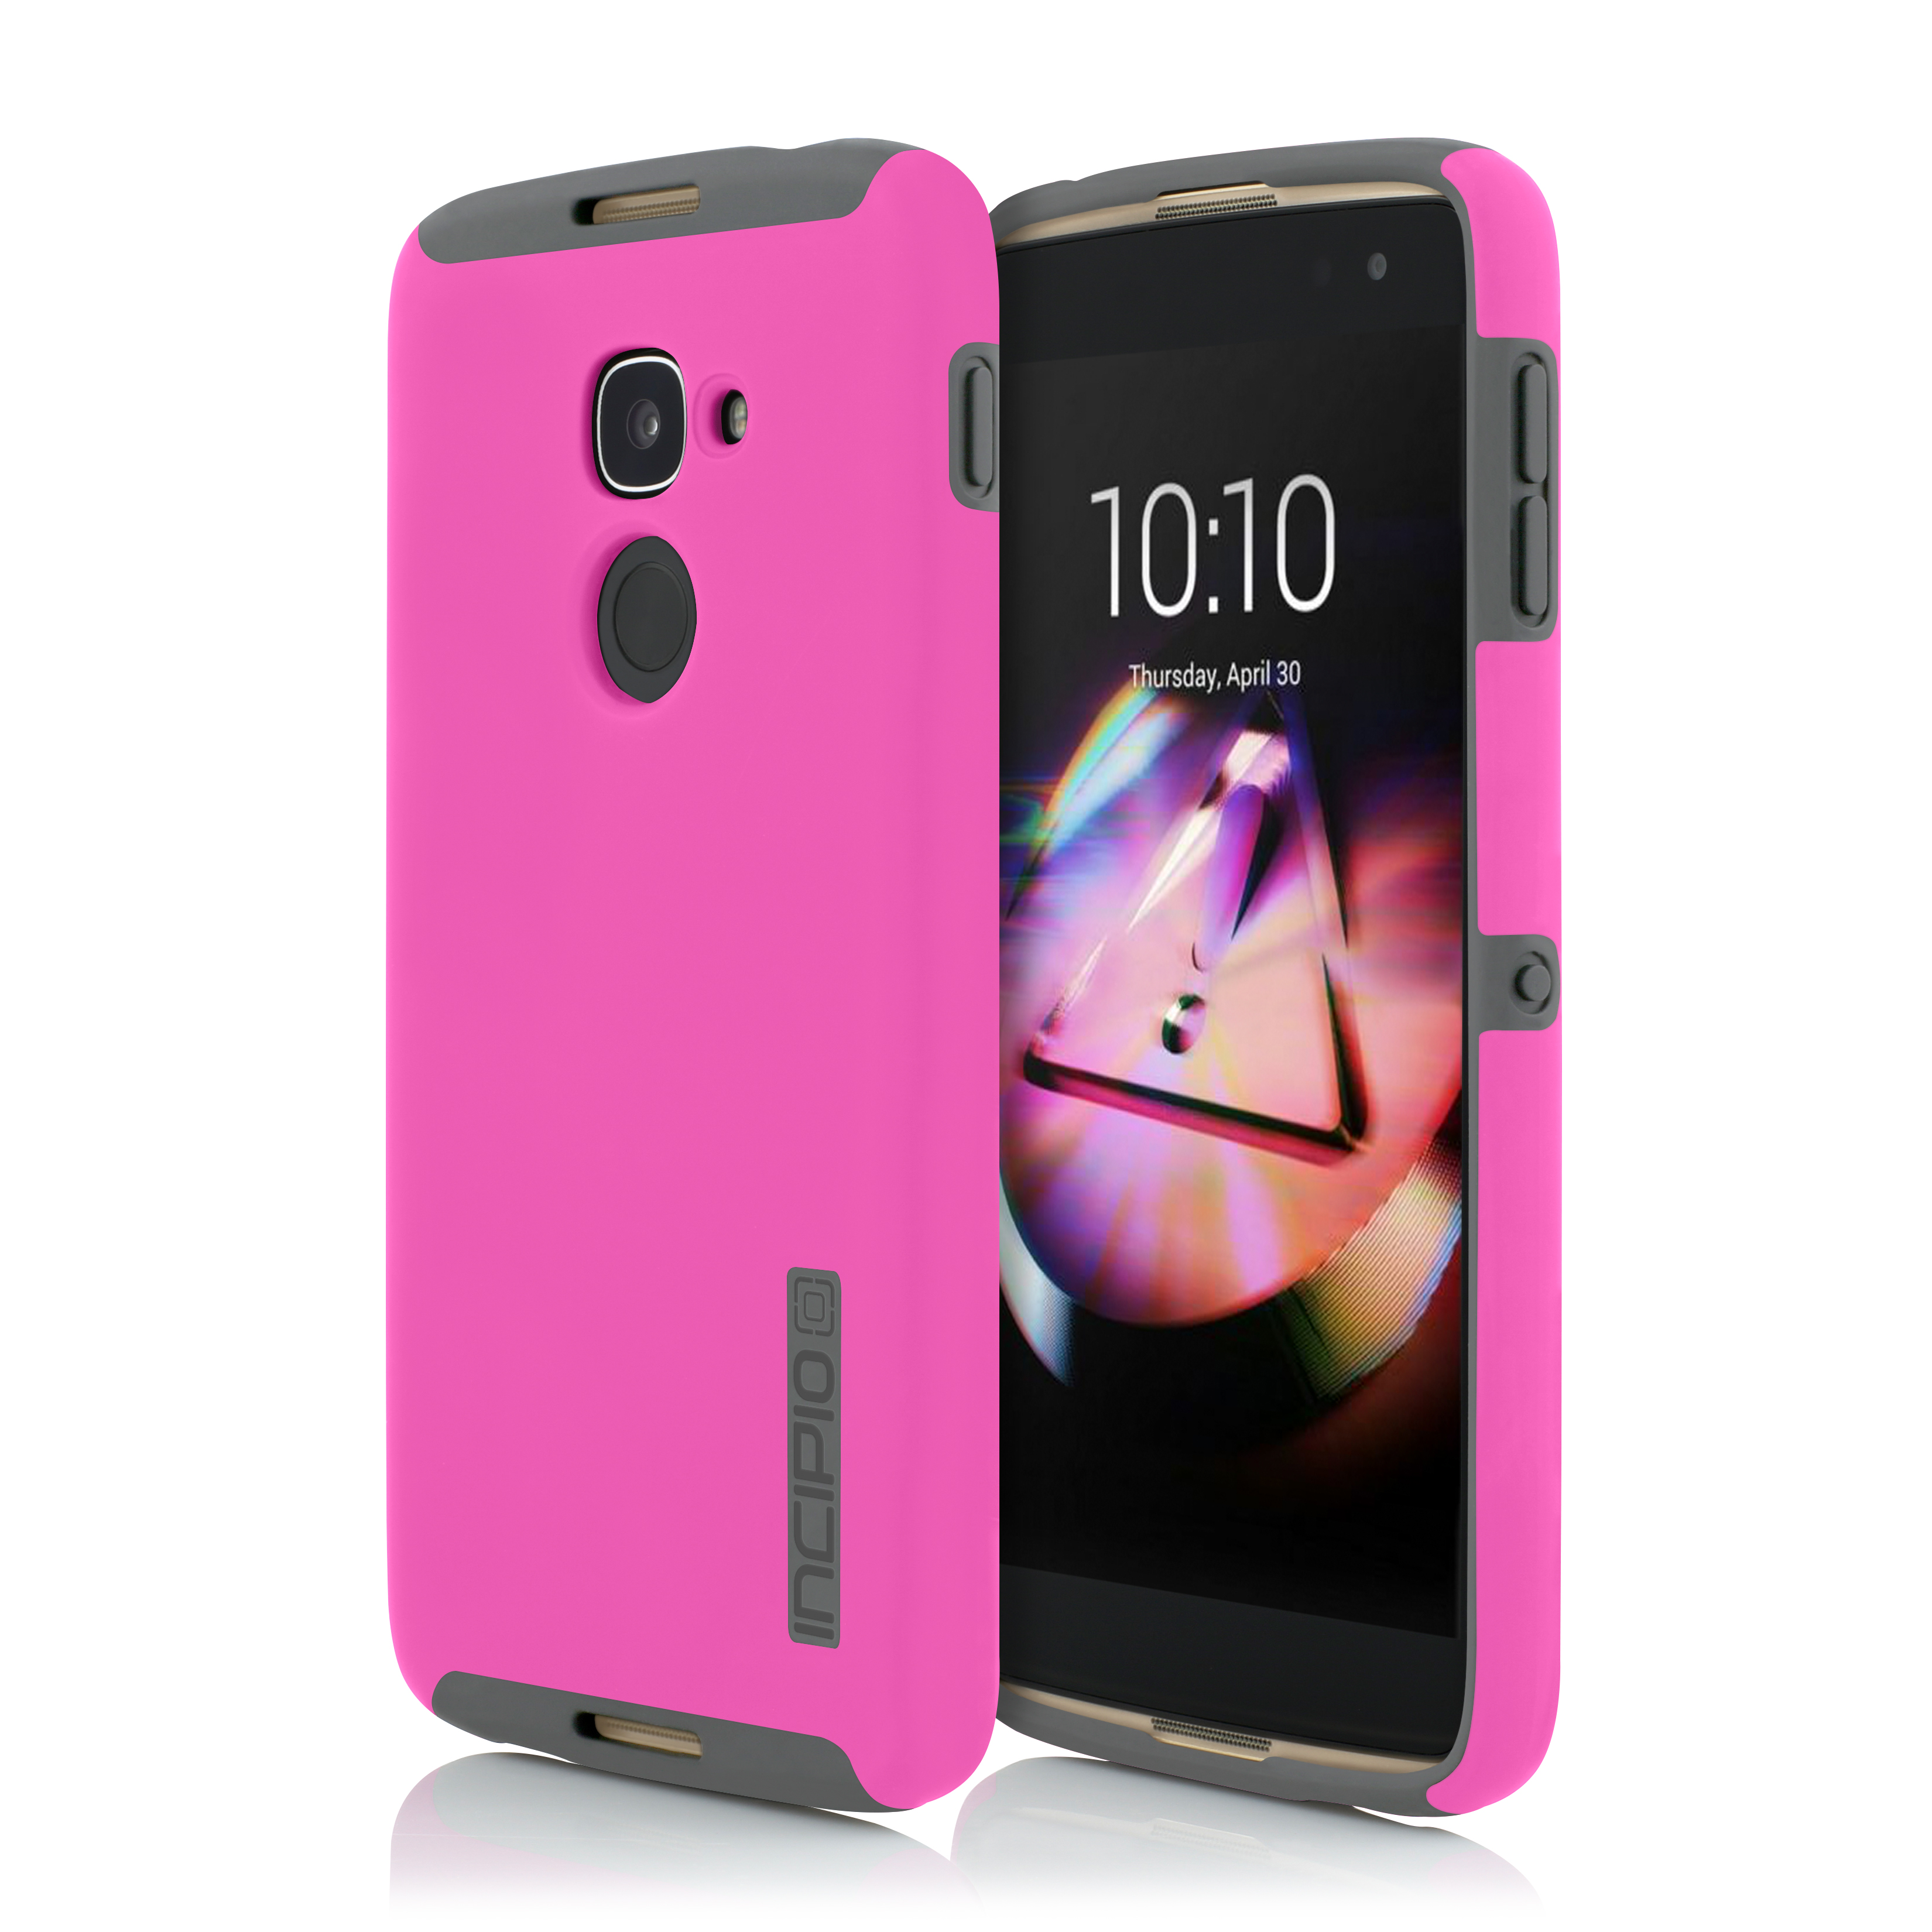 Incipio Gallery Goospery Iphone 6 6s Pearl Jelly Case Pink Al